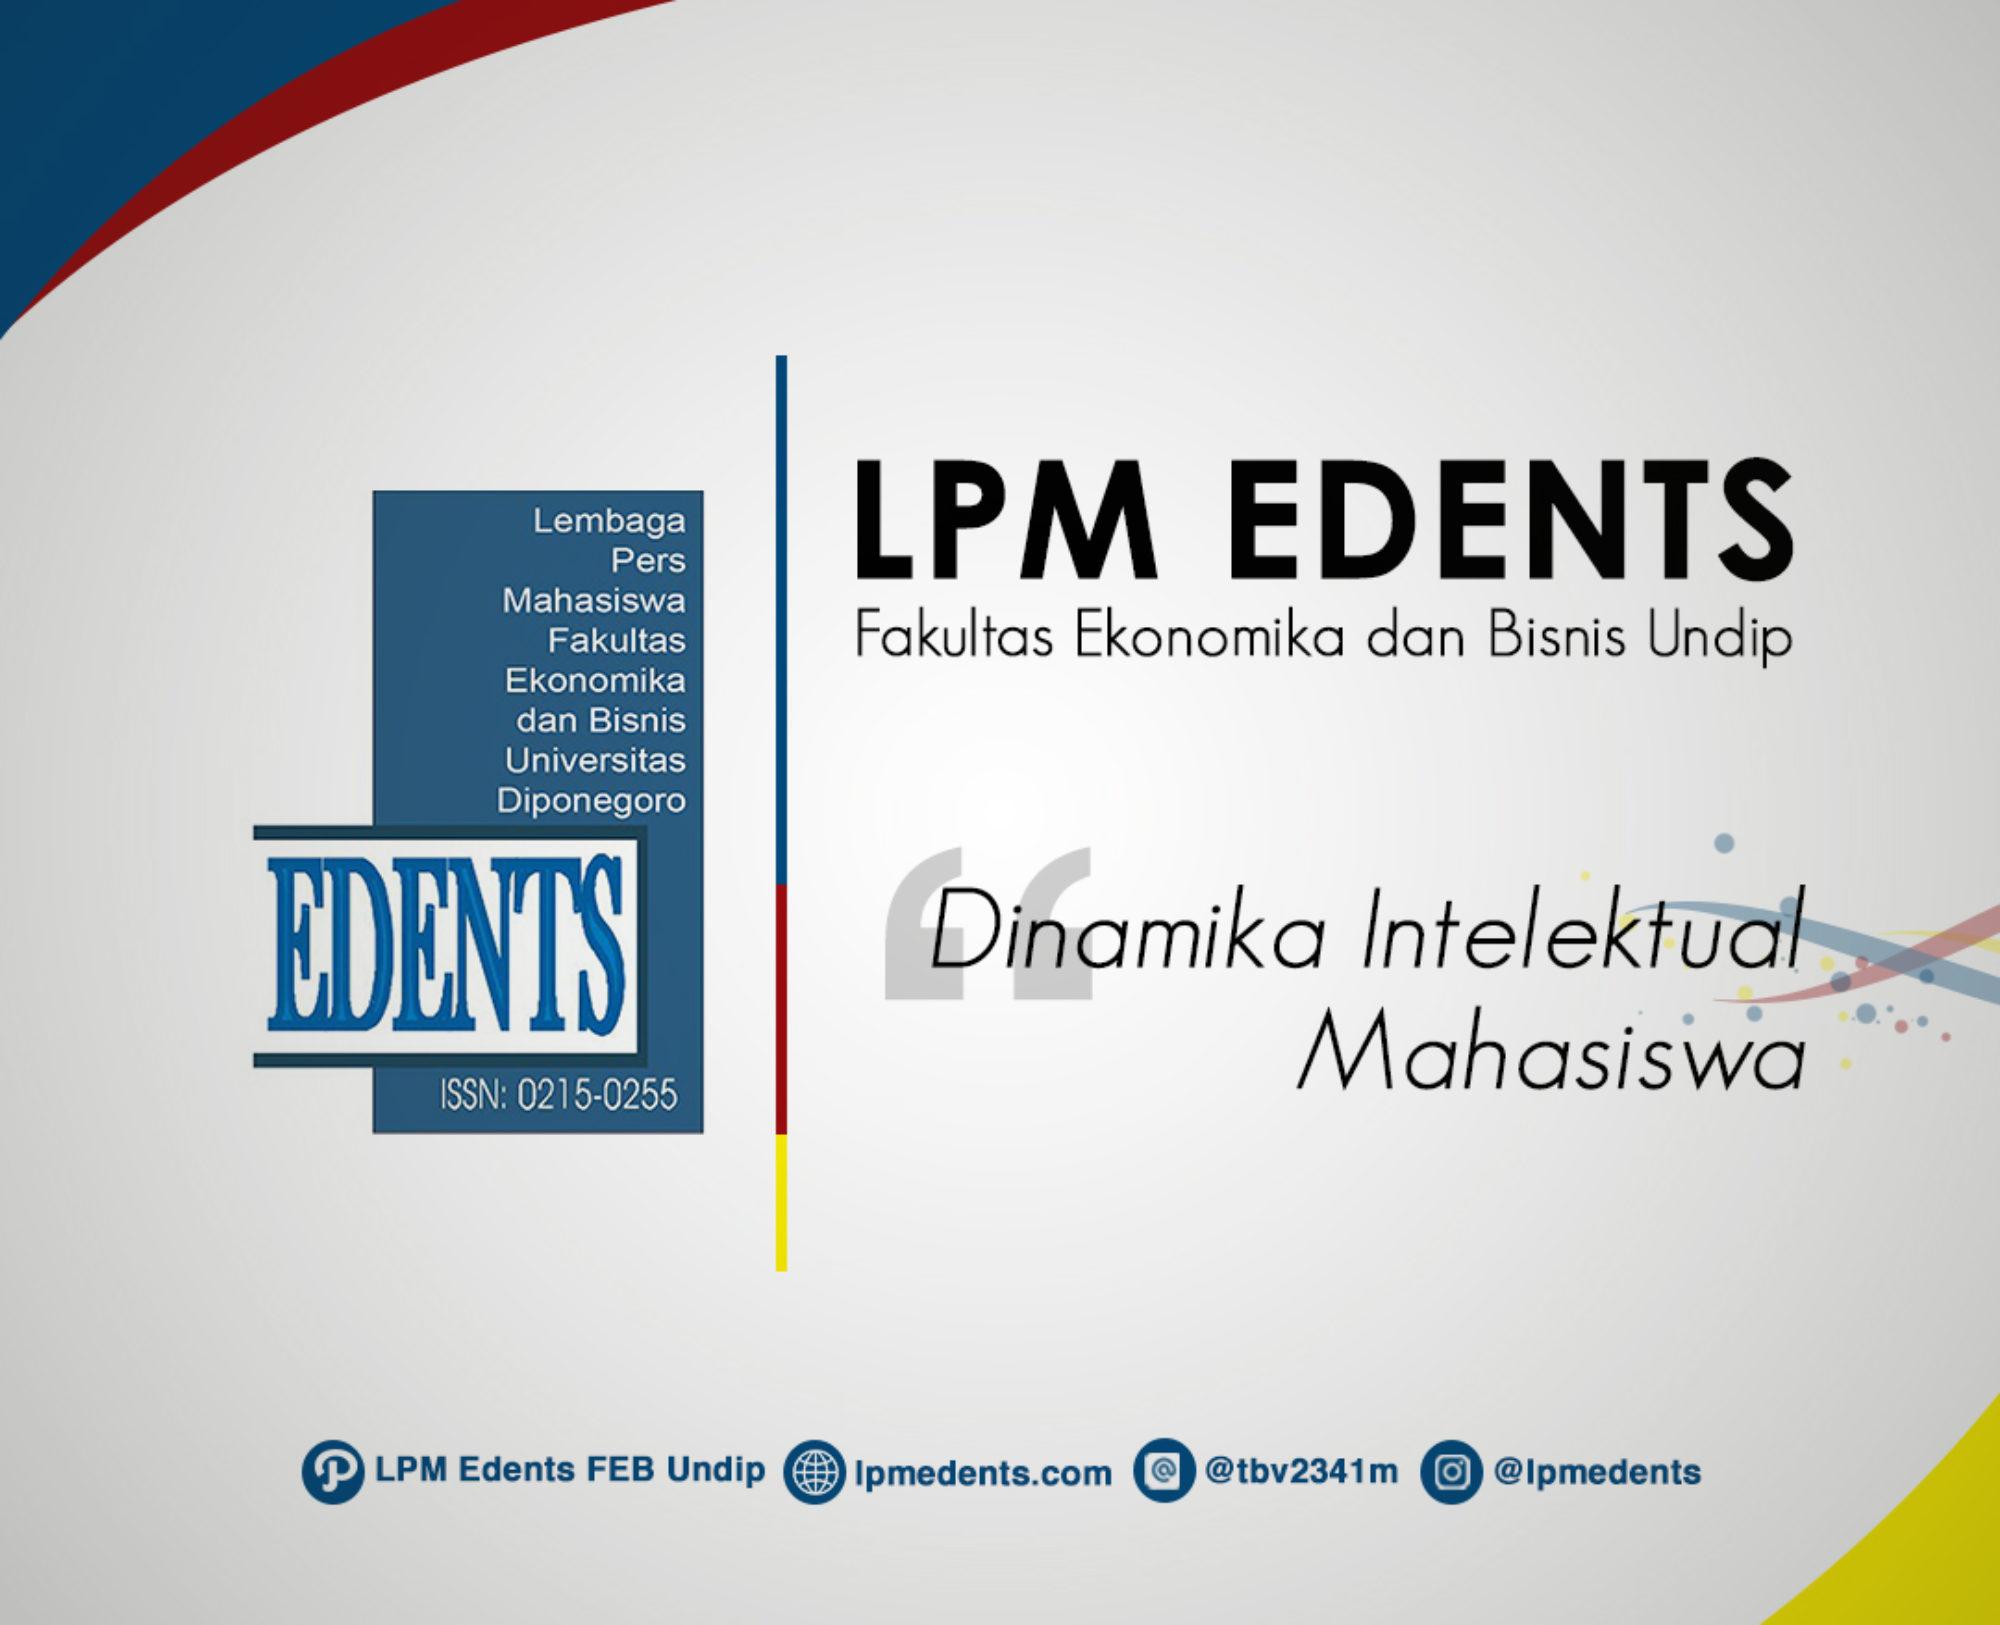 LPM EDENTS